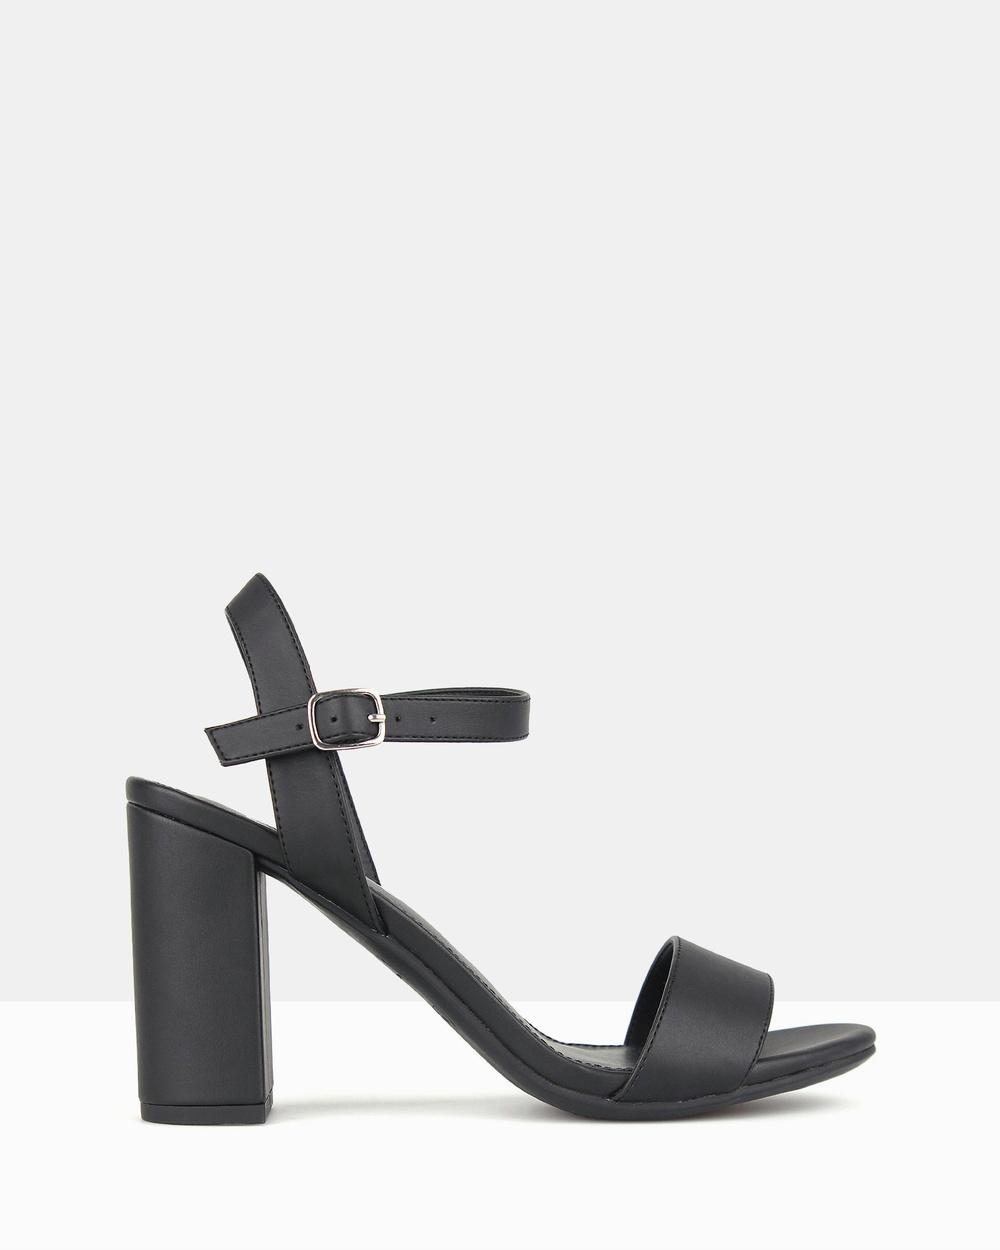 Betts Karly Block Heel Sandals Black